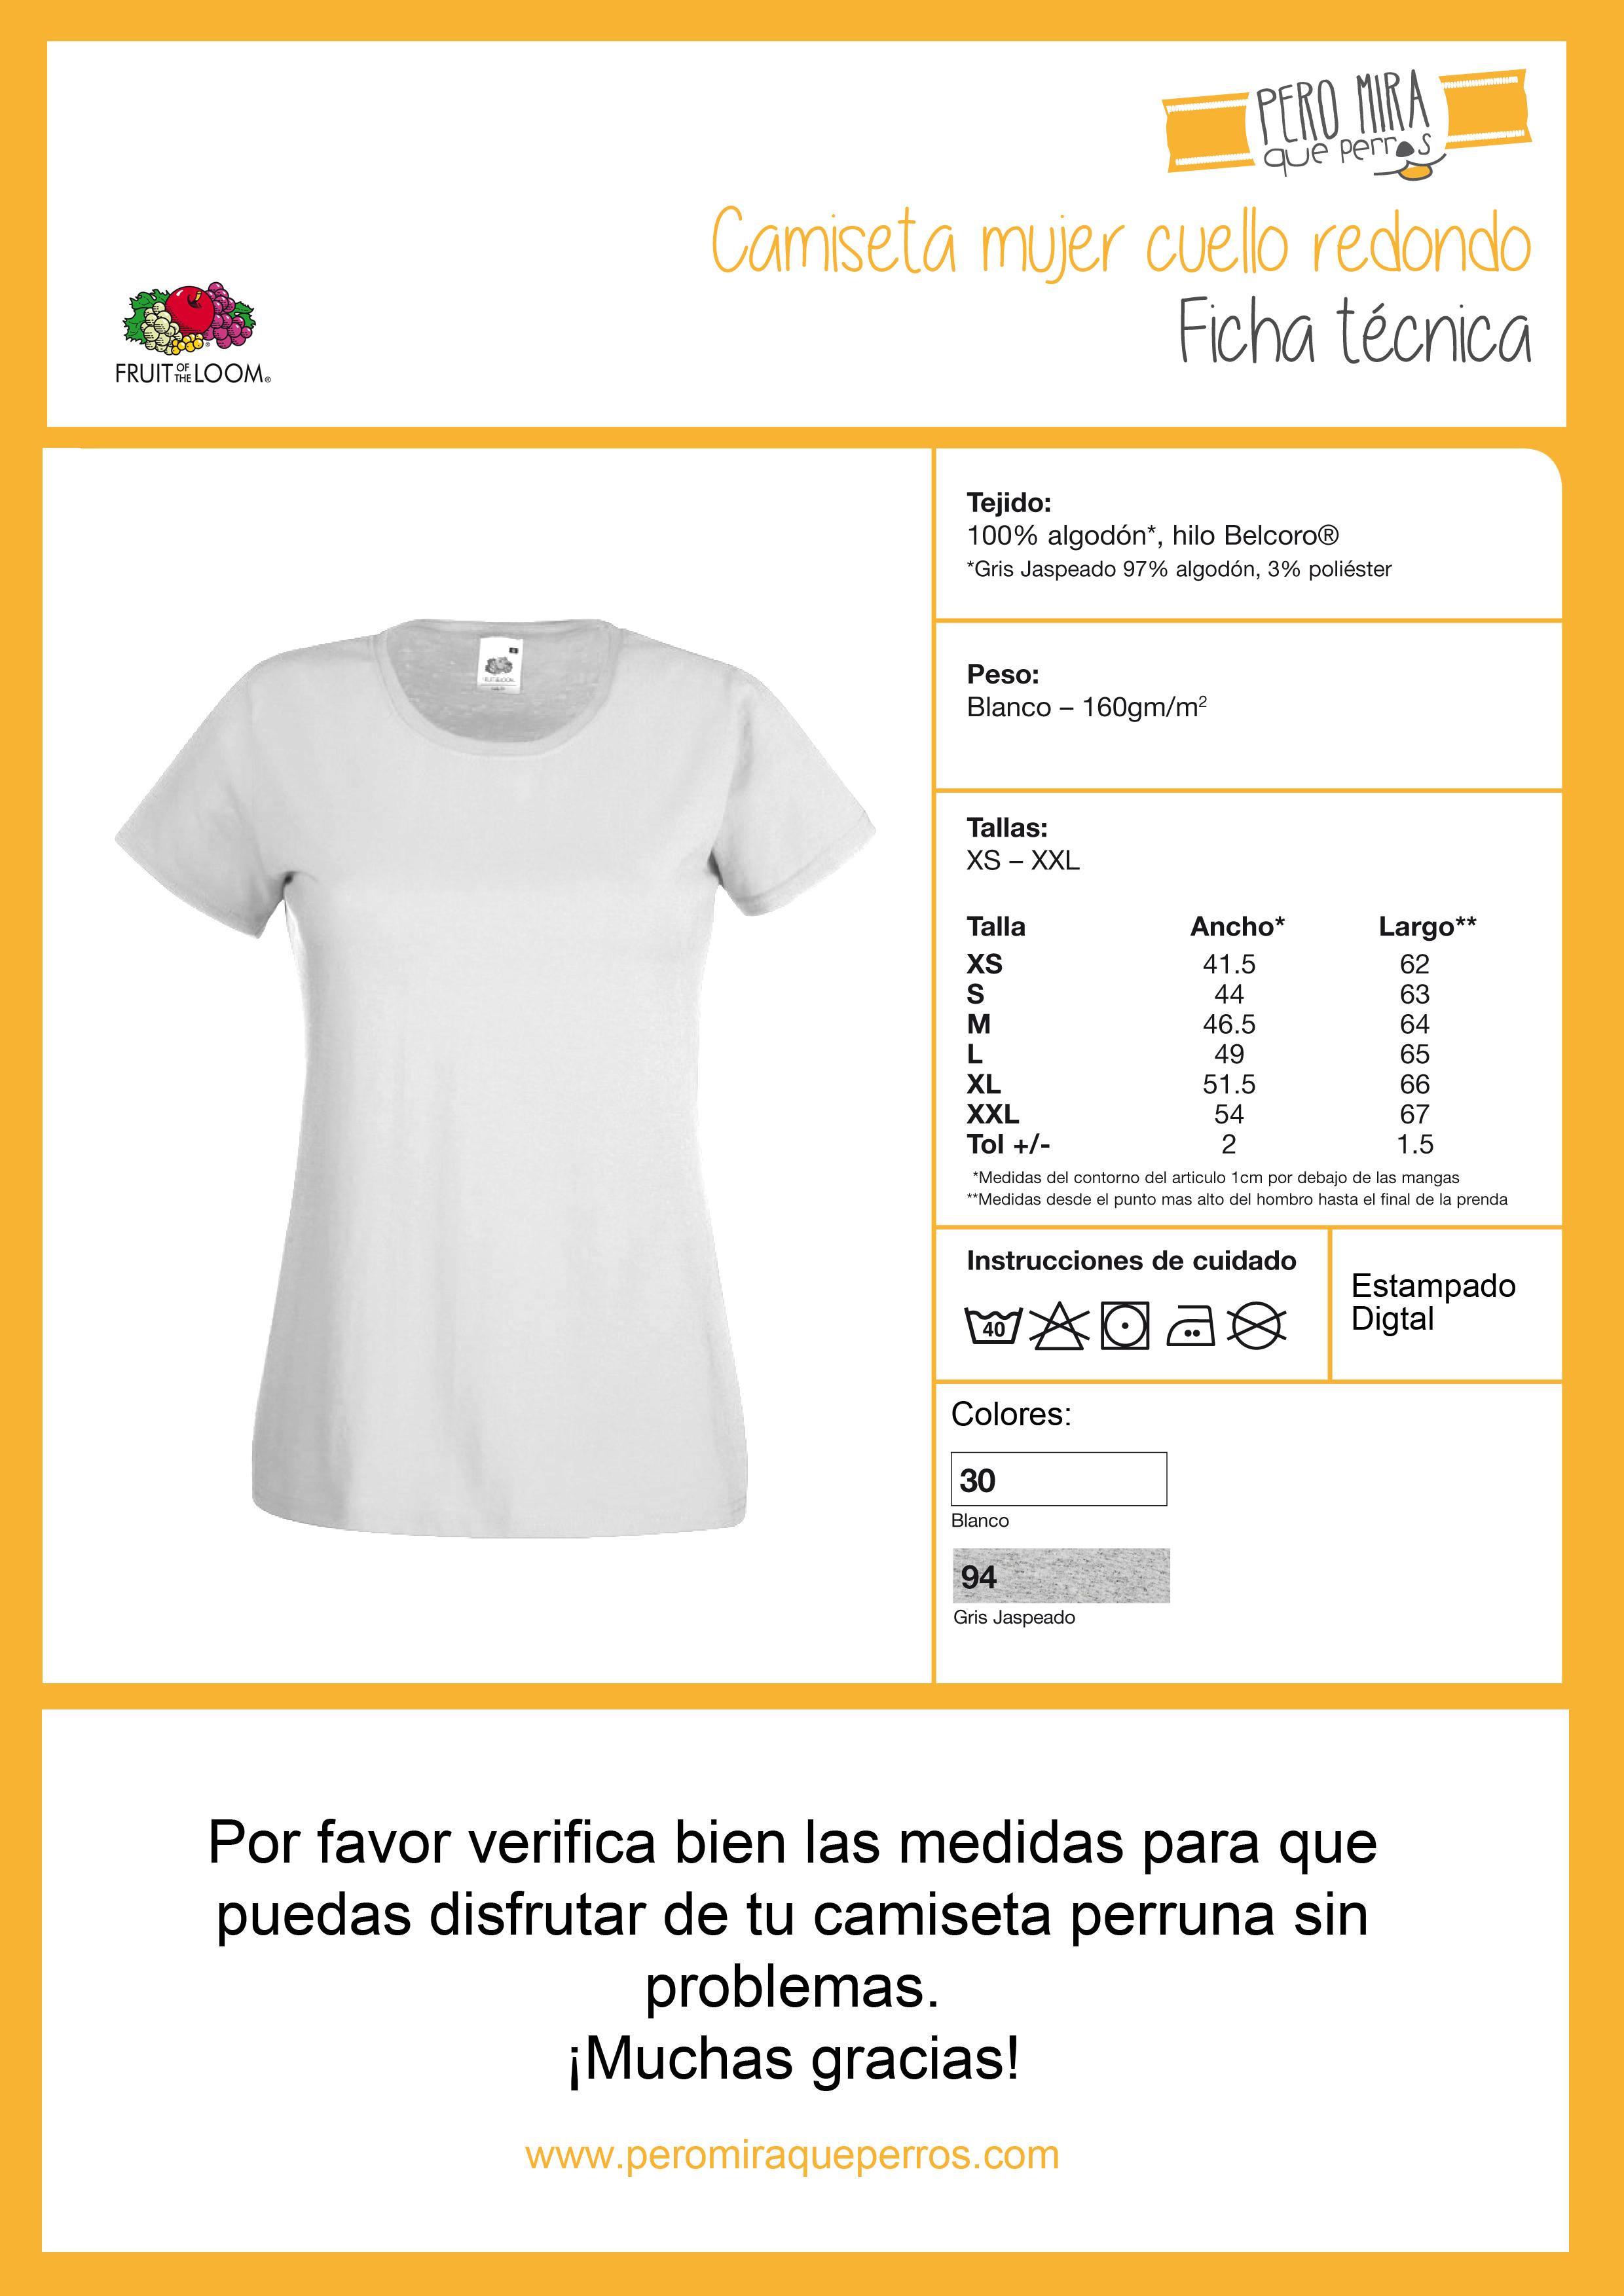 Ficha tecnica camiseta Amor perruno